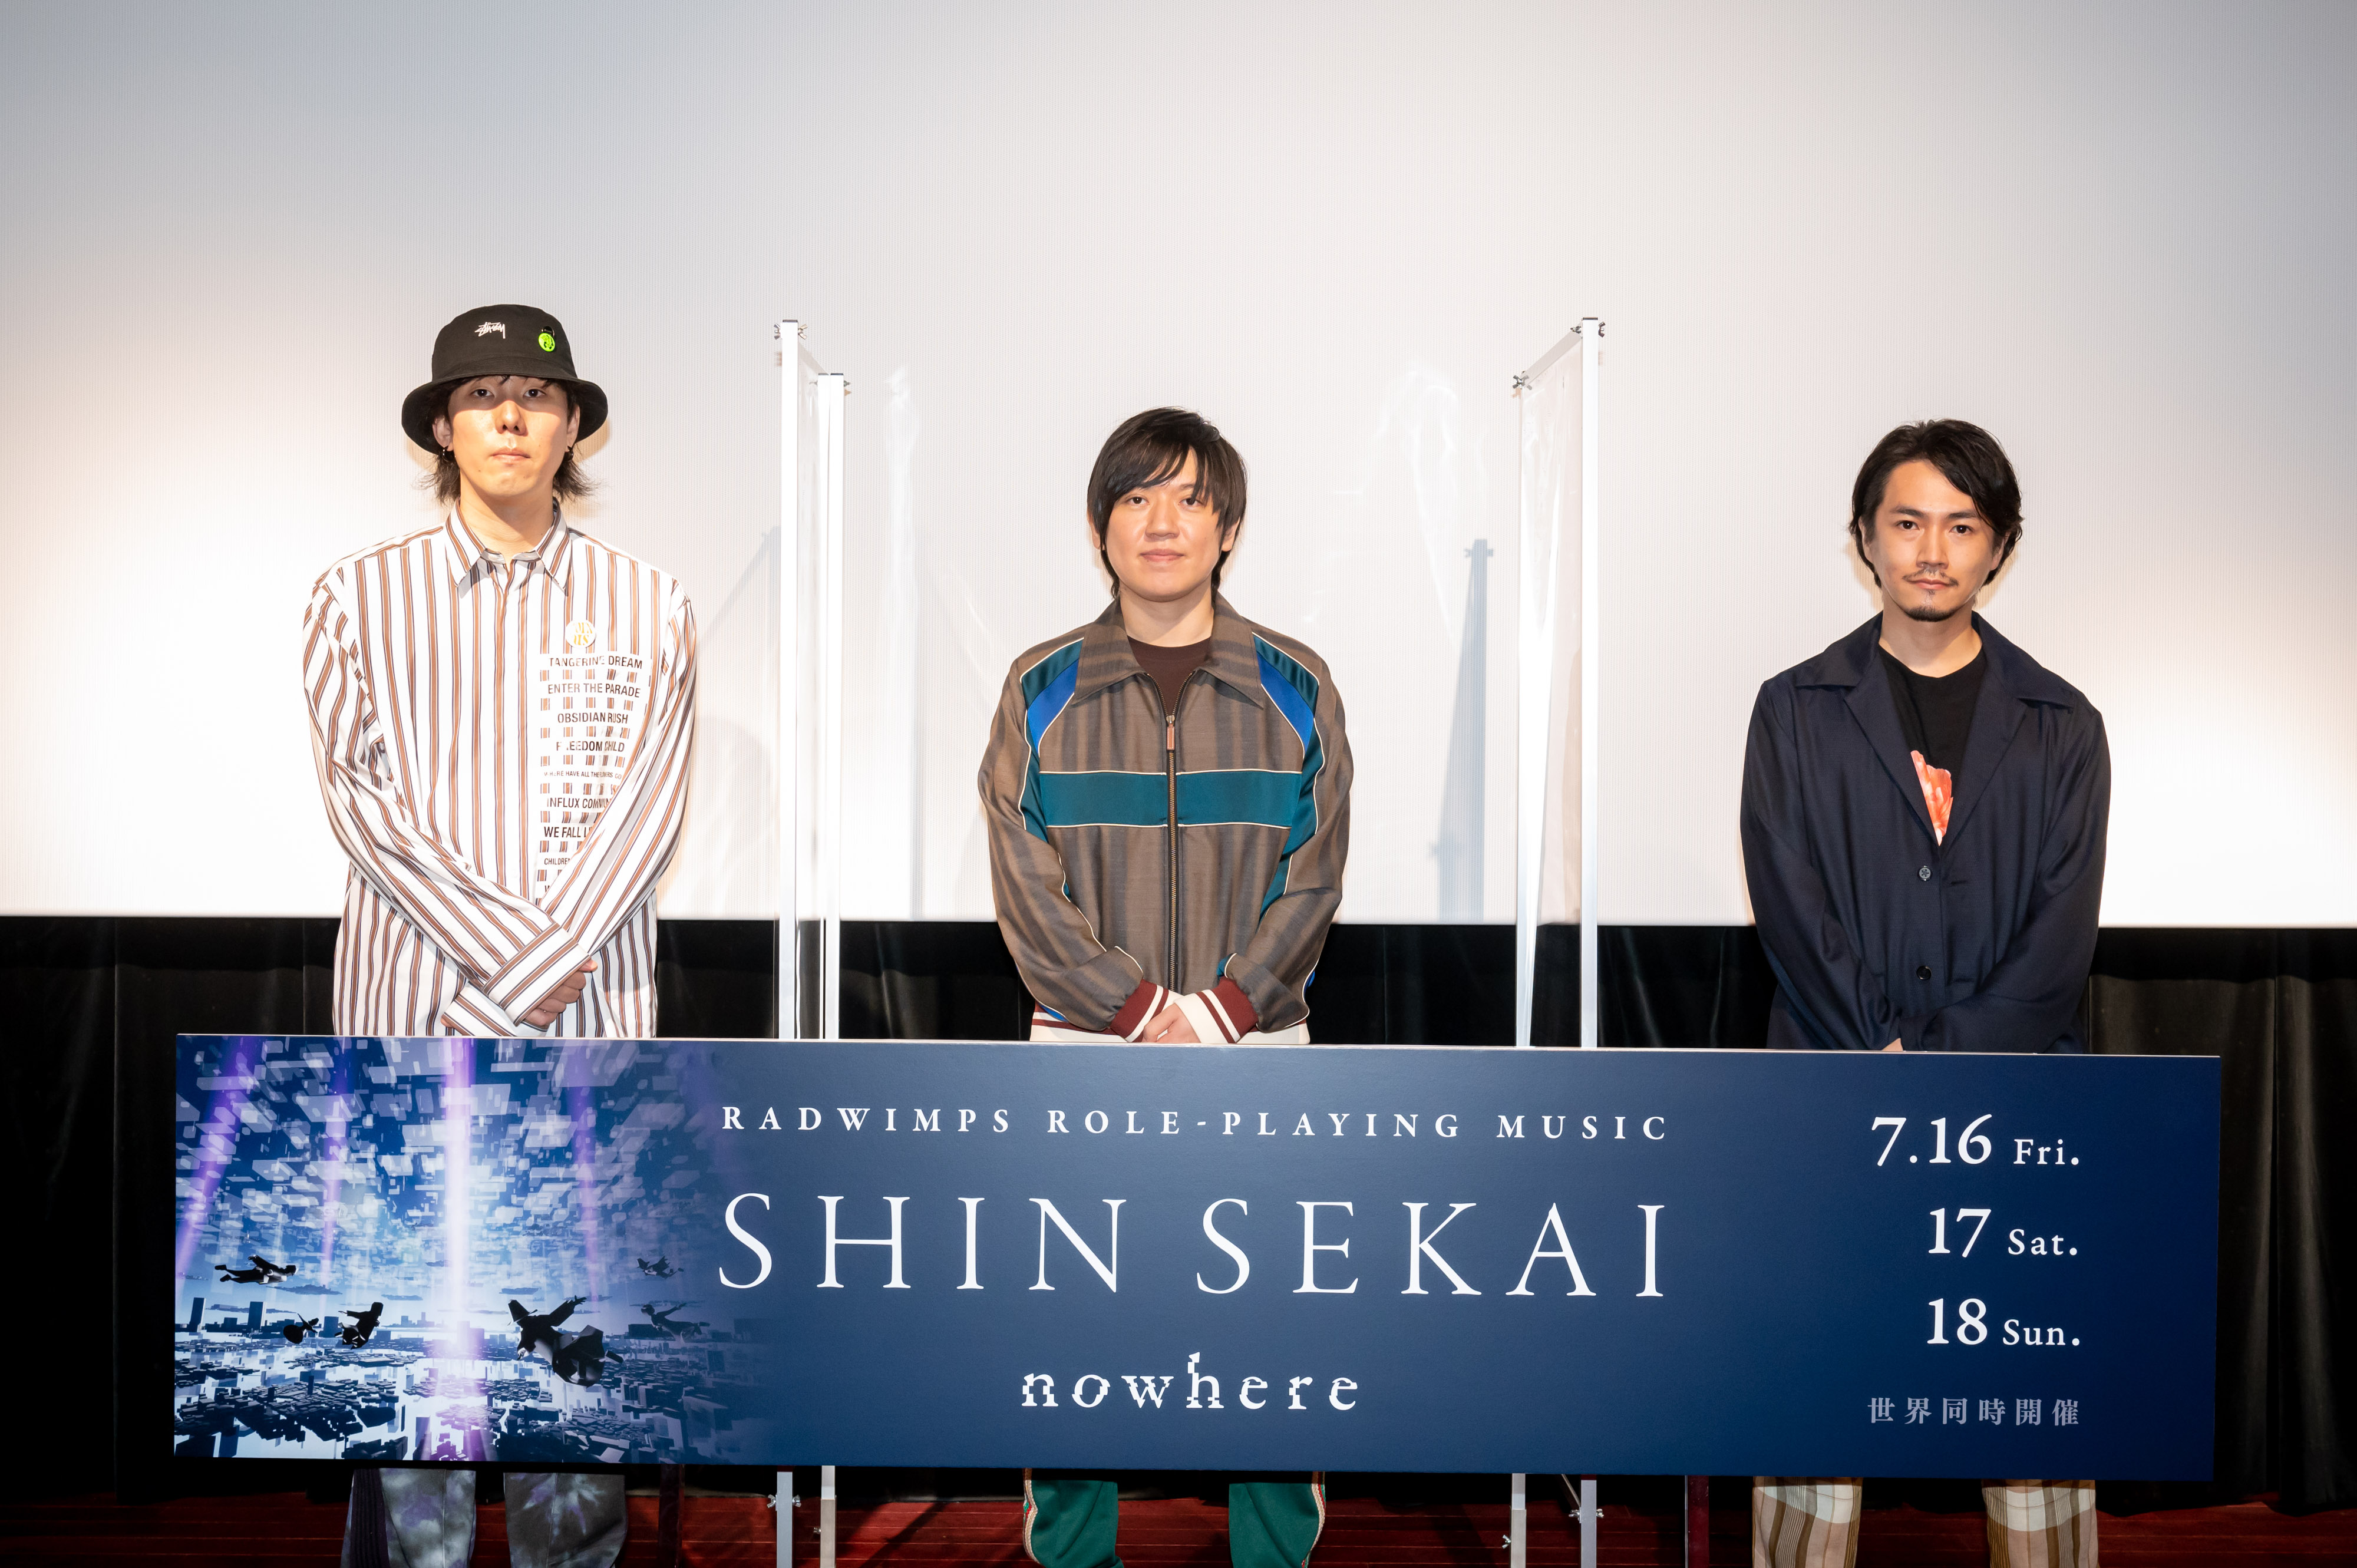 shinsekai0712_2-2